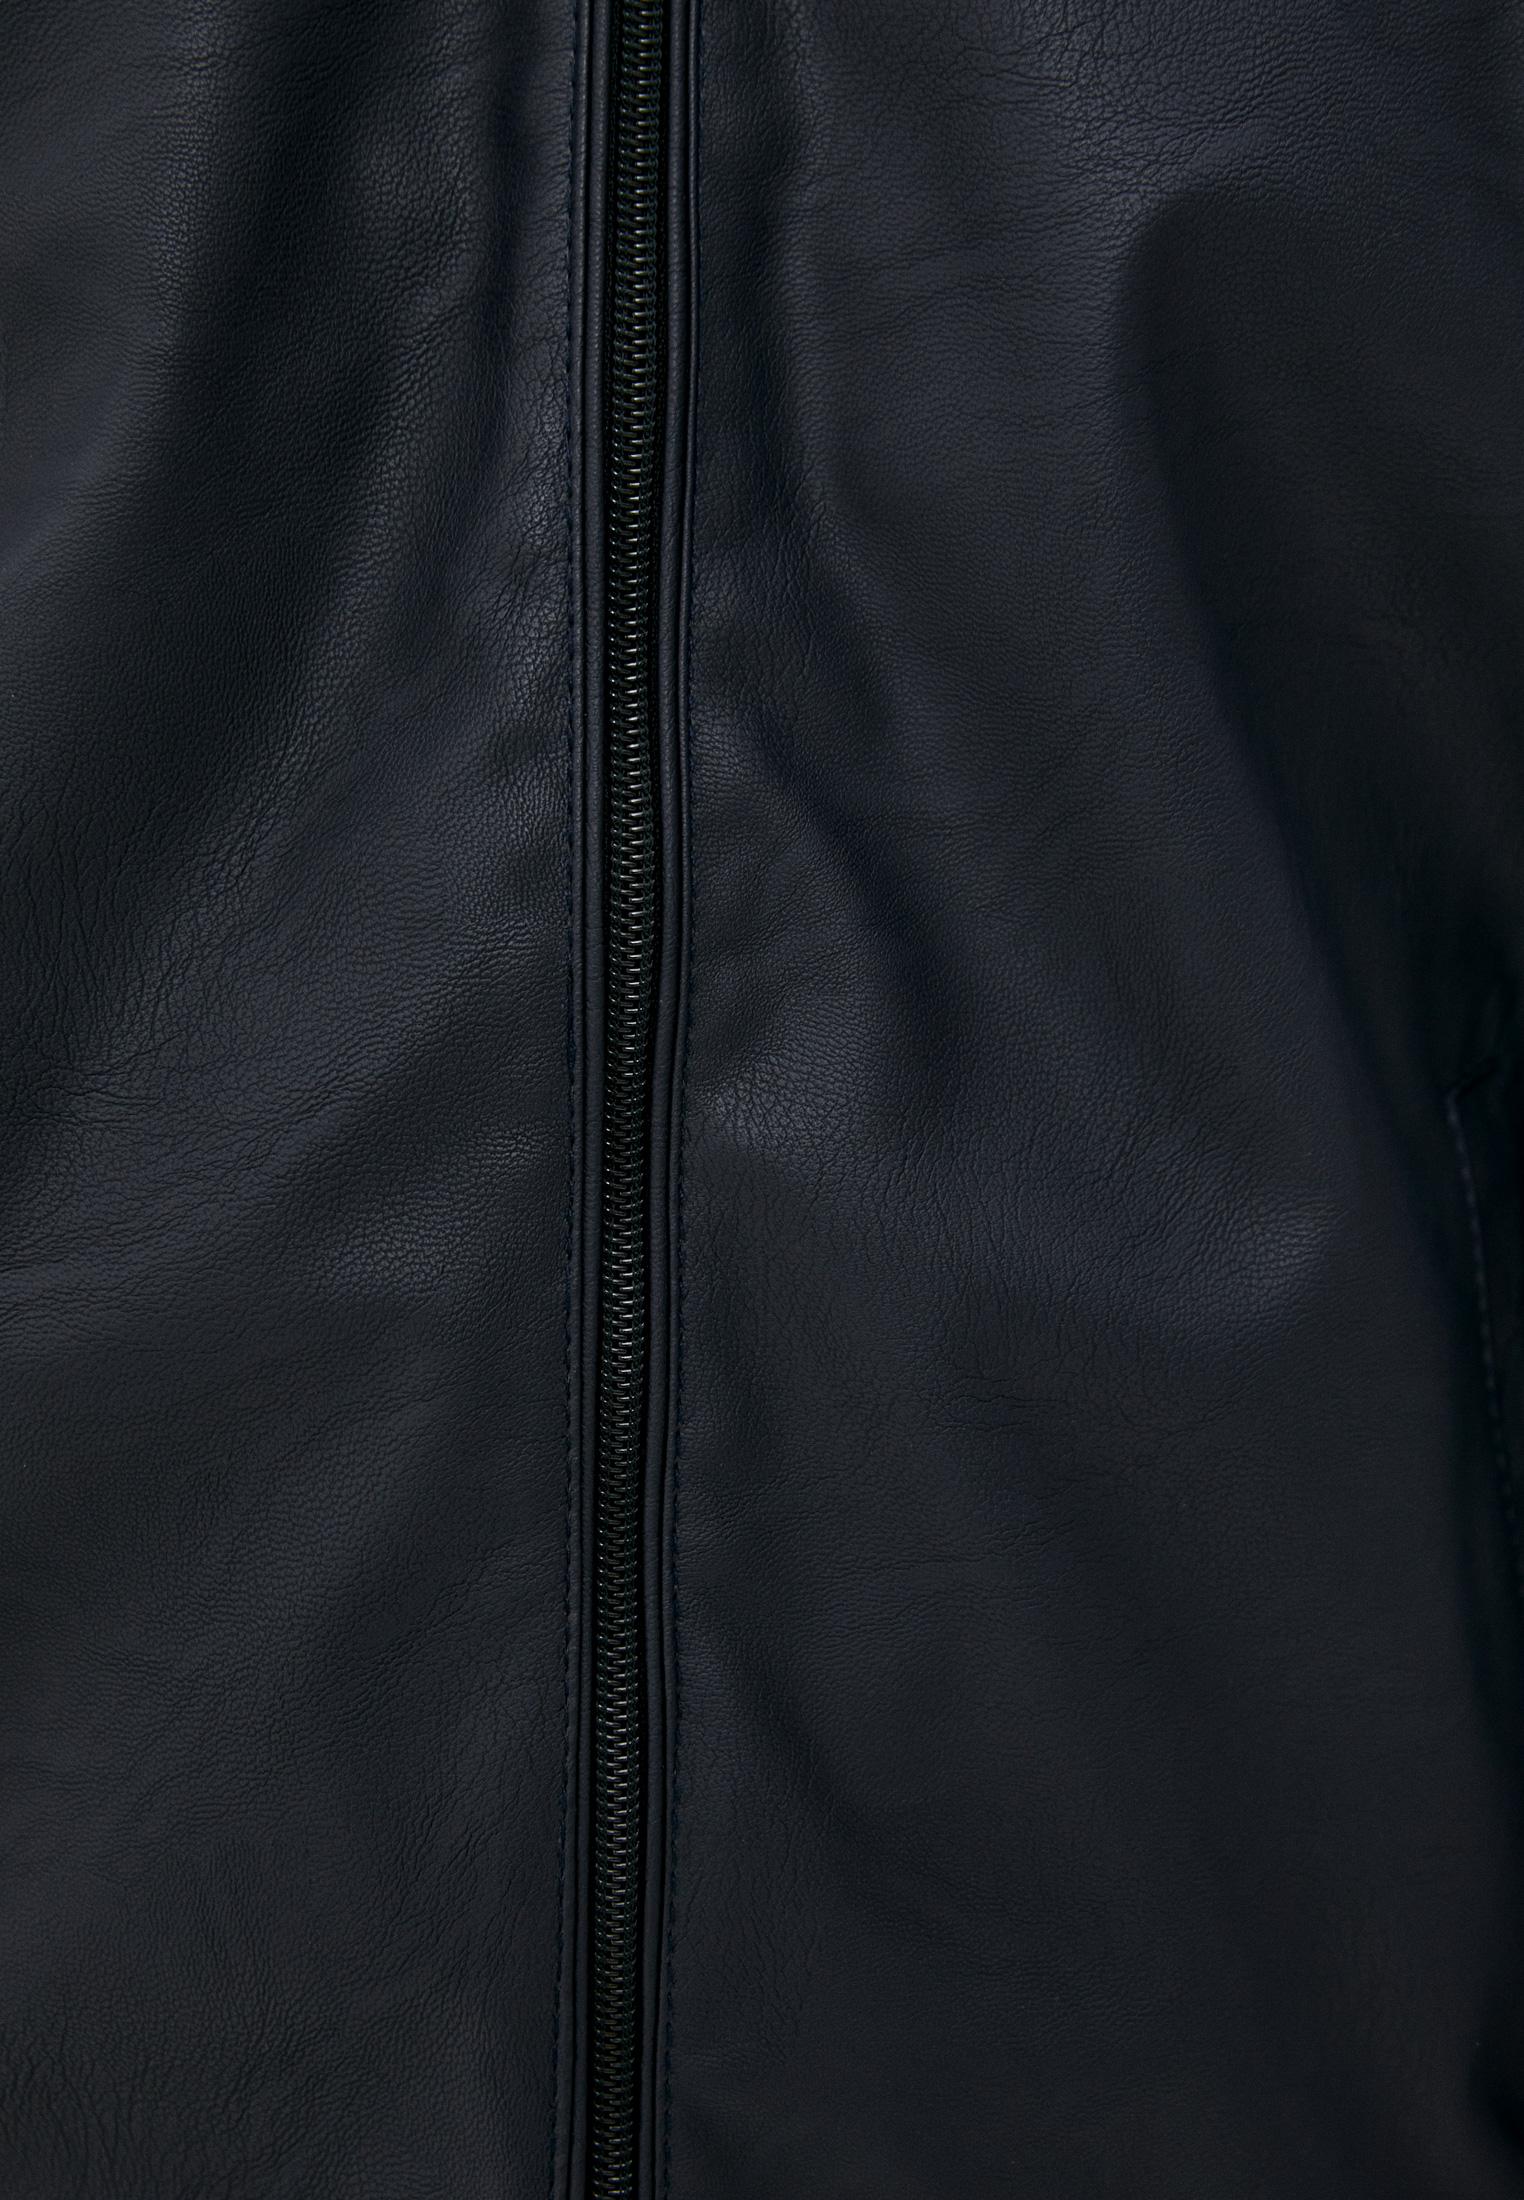 Кожаная куртка Armani Jeans (Армани Джинс) 6E01Z: изображение 5